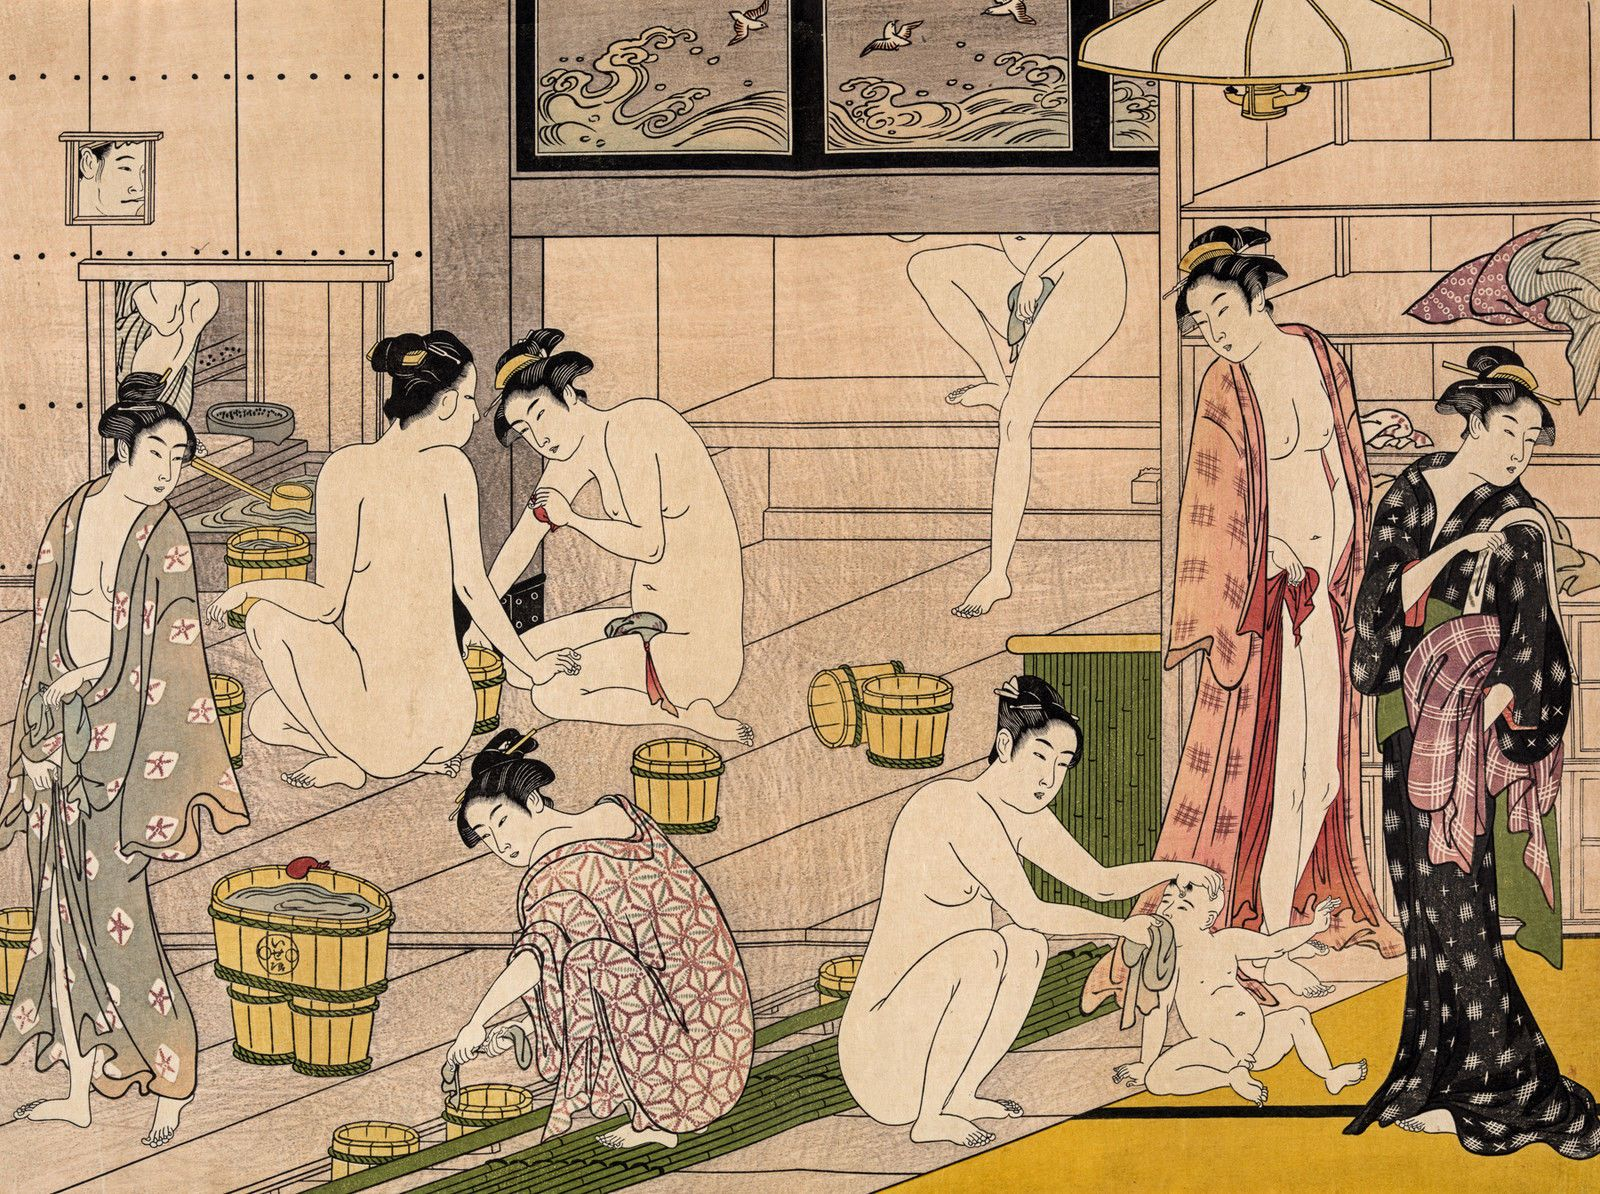 Erotic asian bathhouse